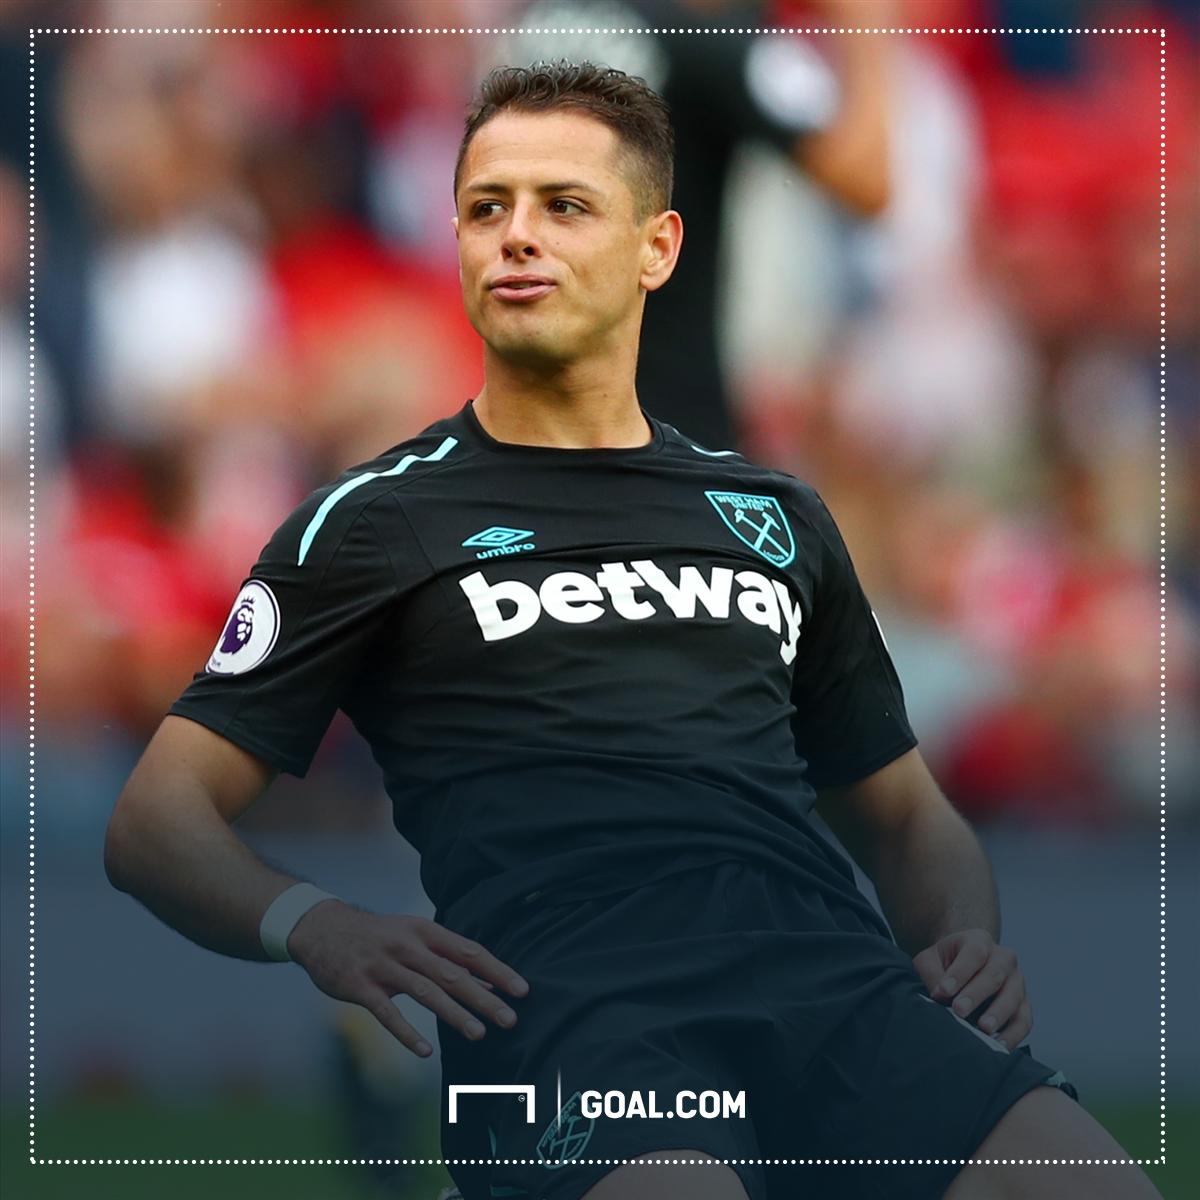 Javier Hernandez has his first West Ham goal! 👏 https://t.co/awMq69fuX...